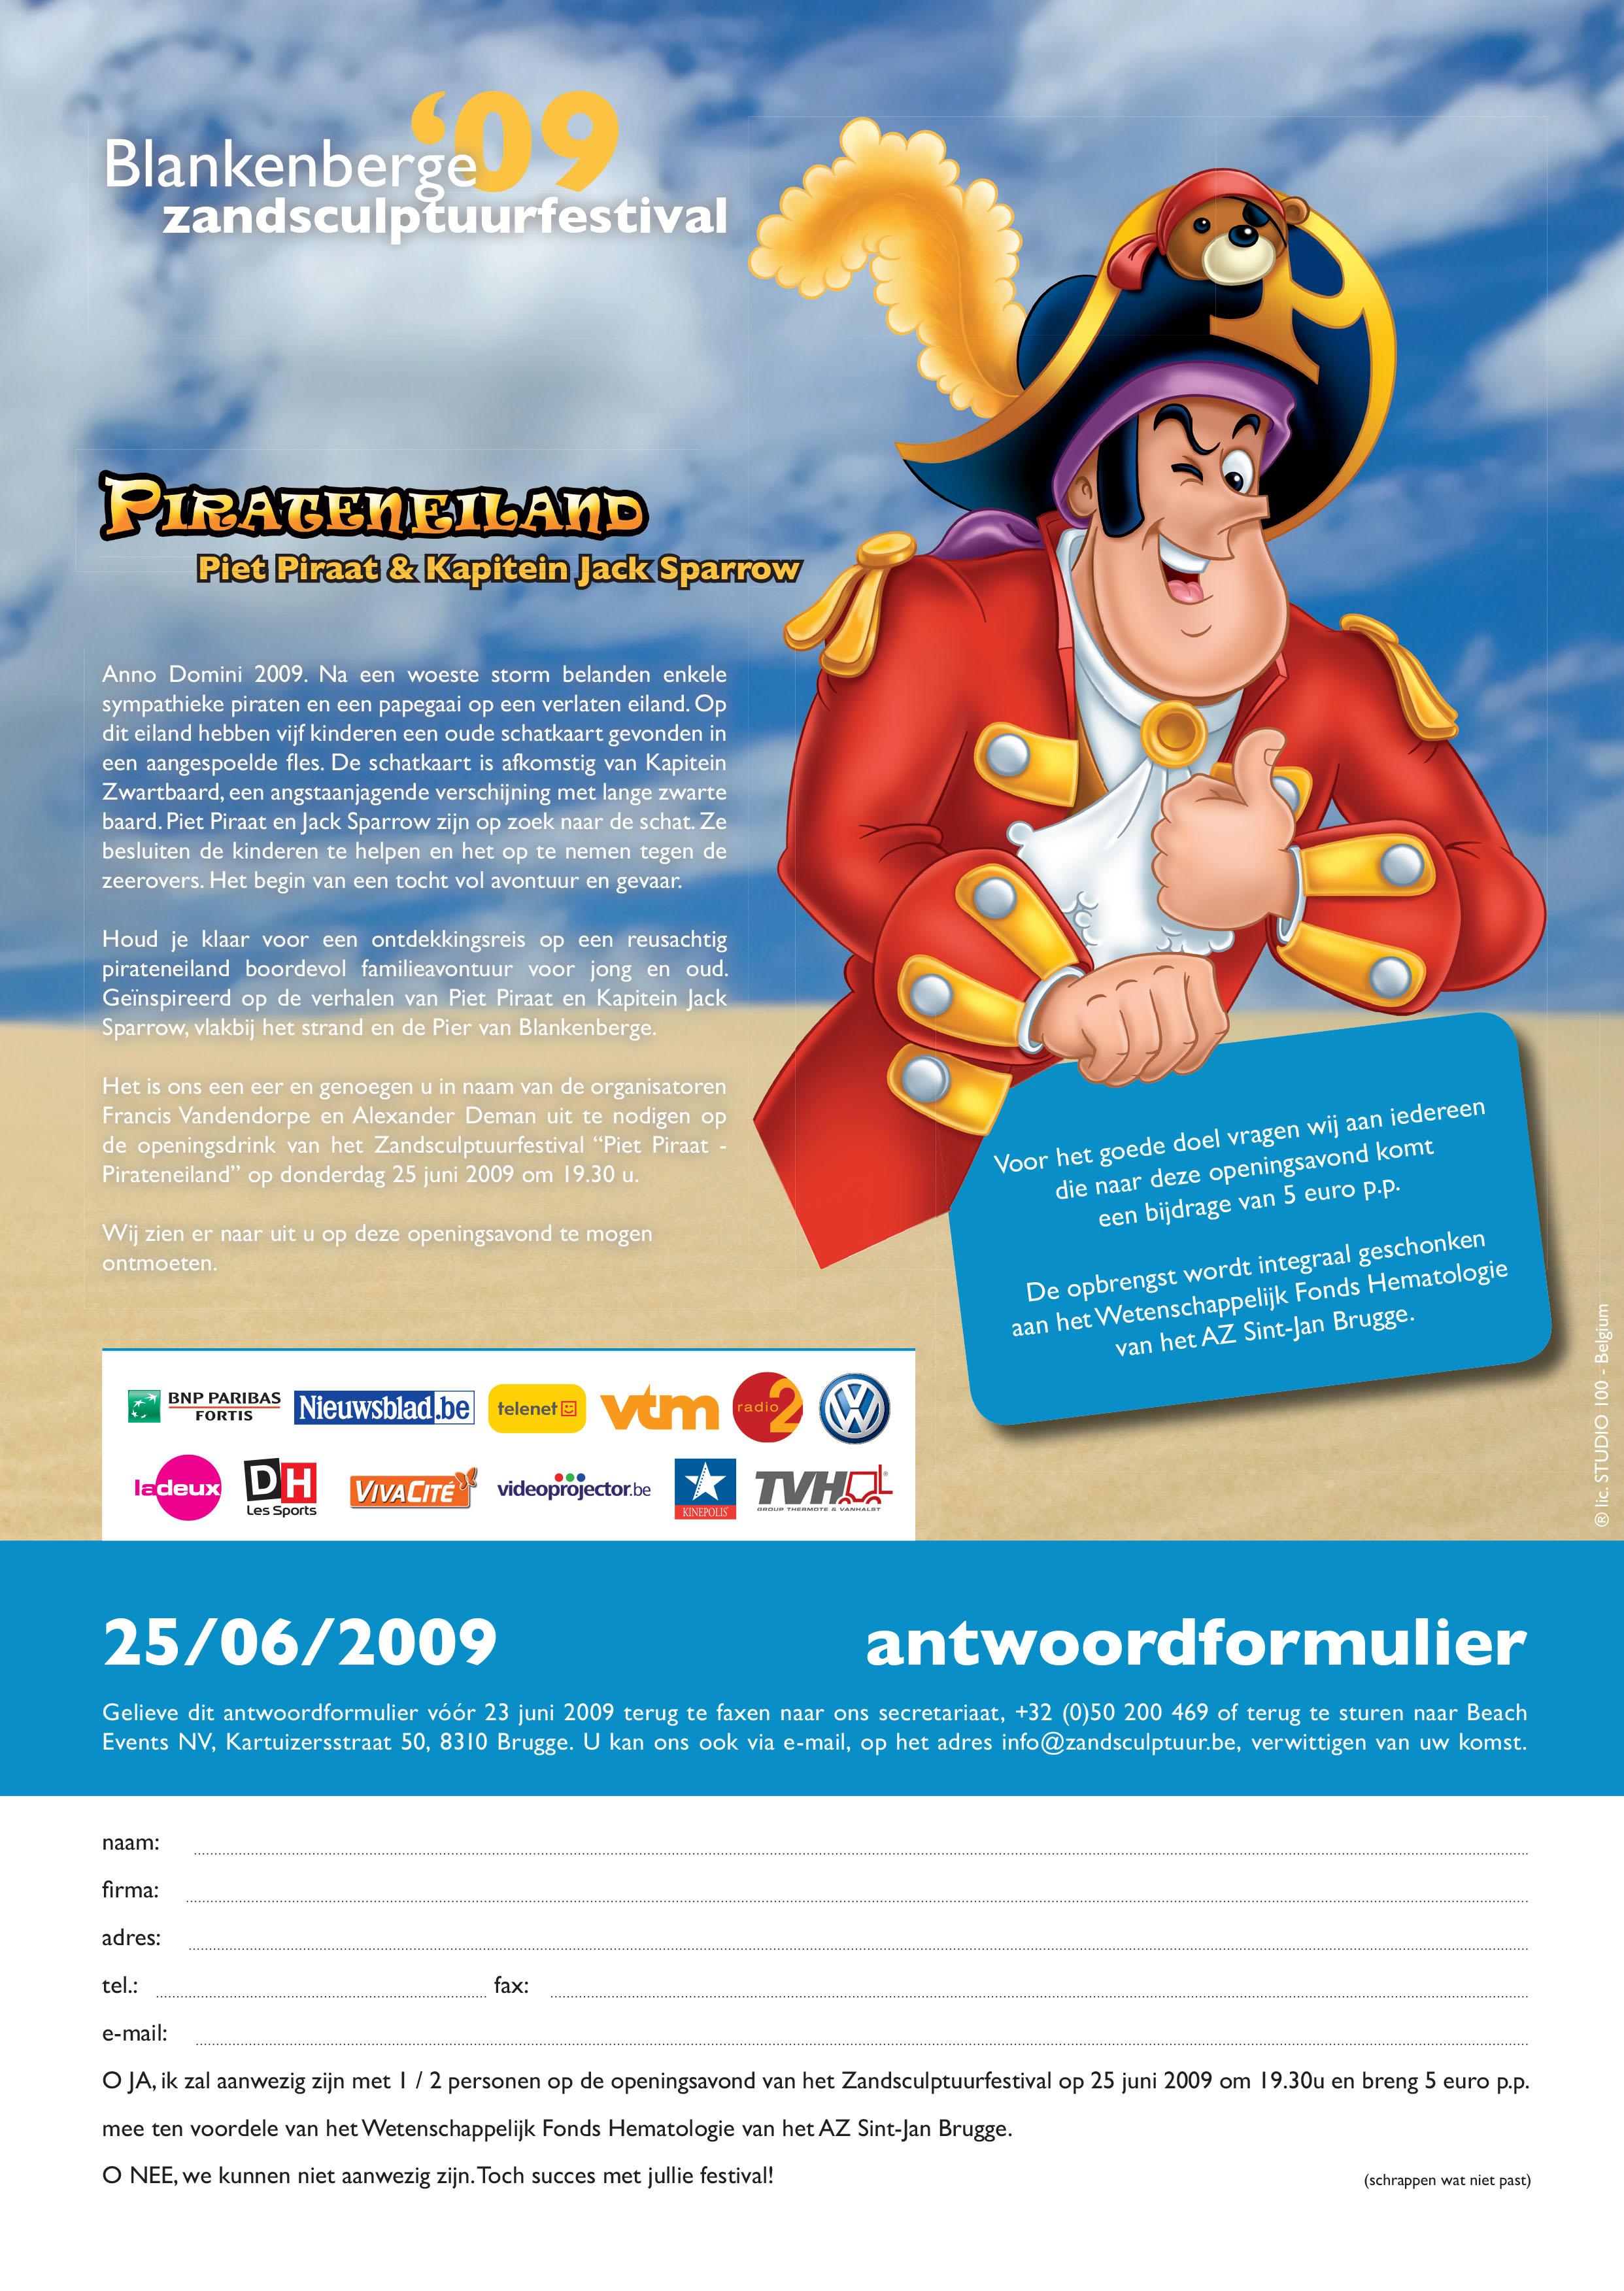 VIP-UITNODIGING_210x297.indd